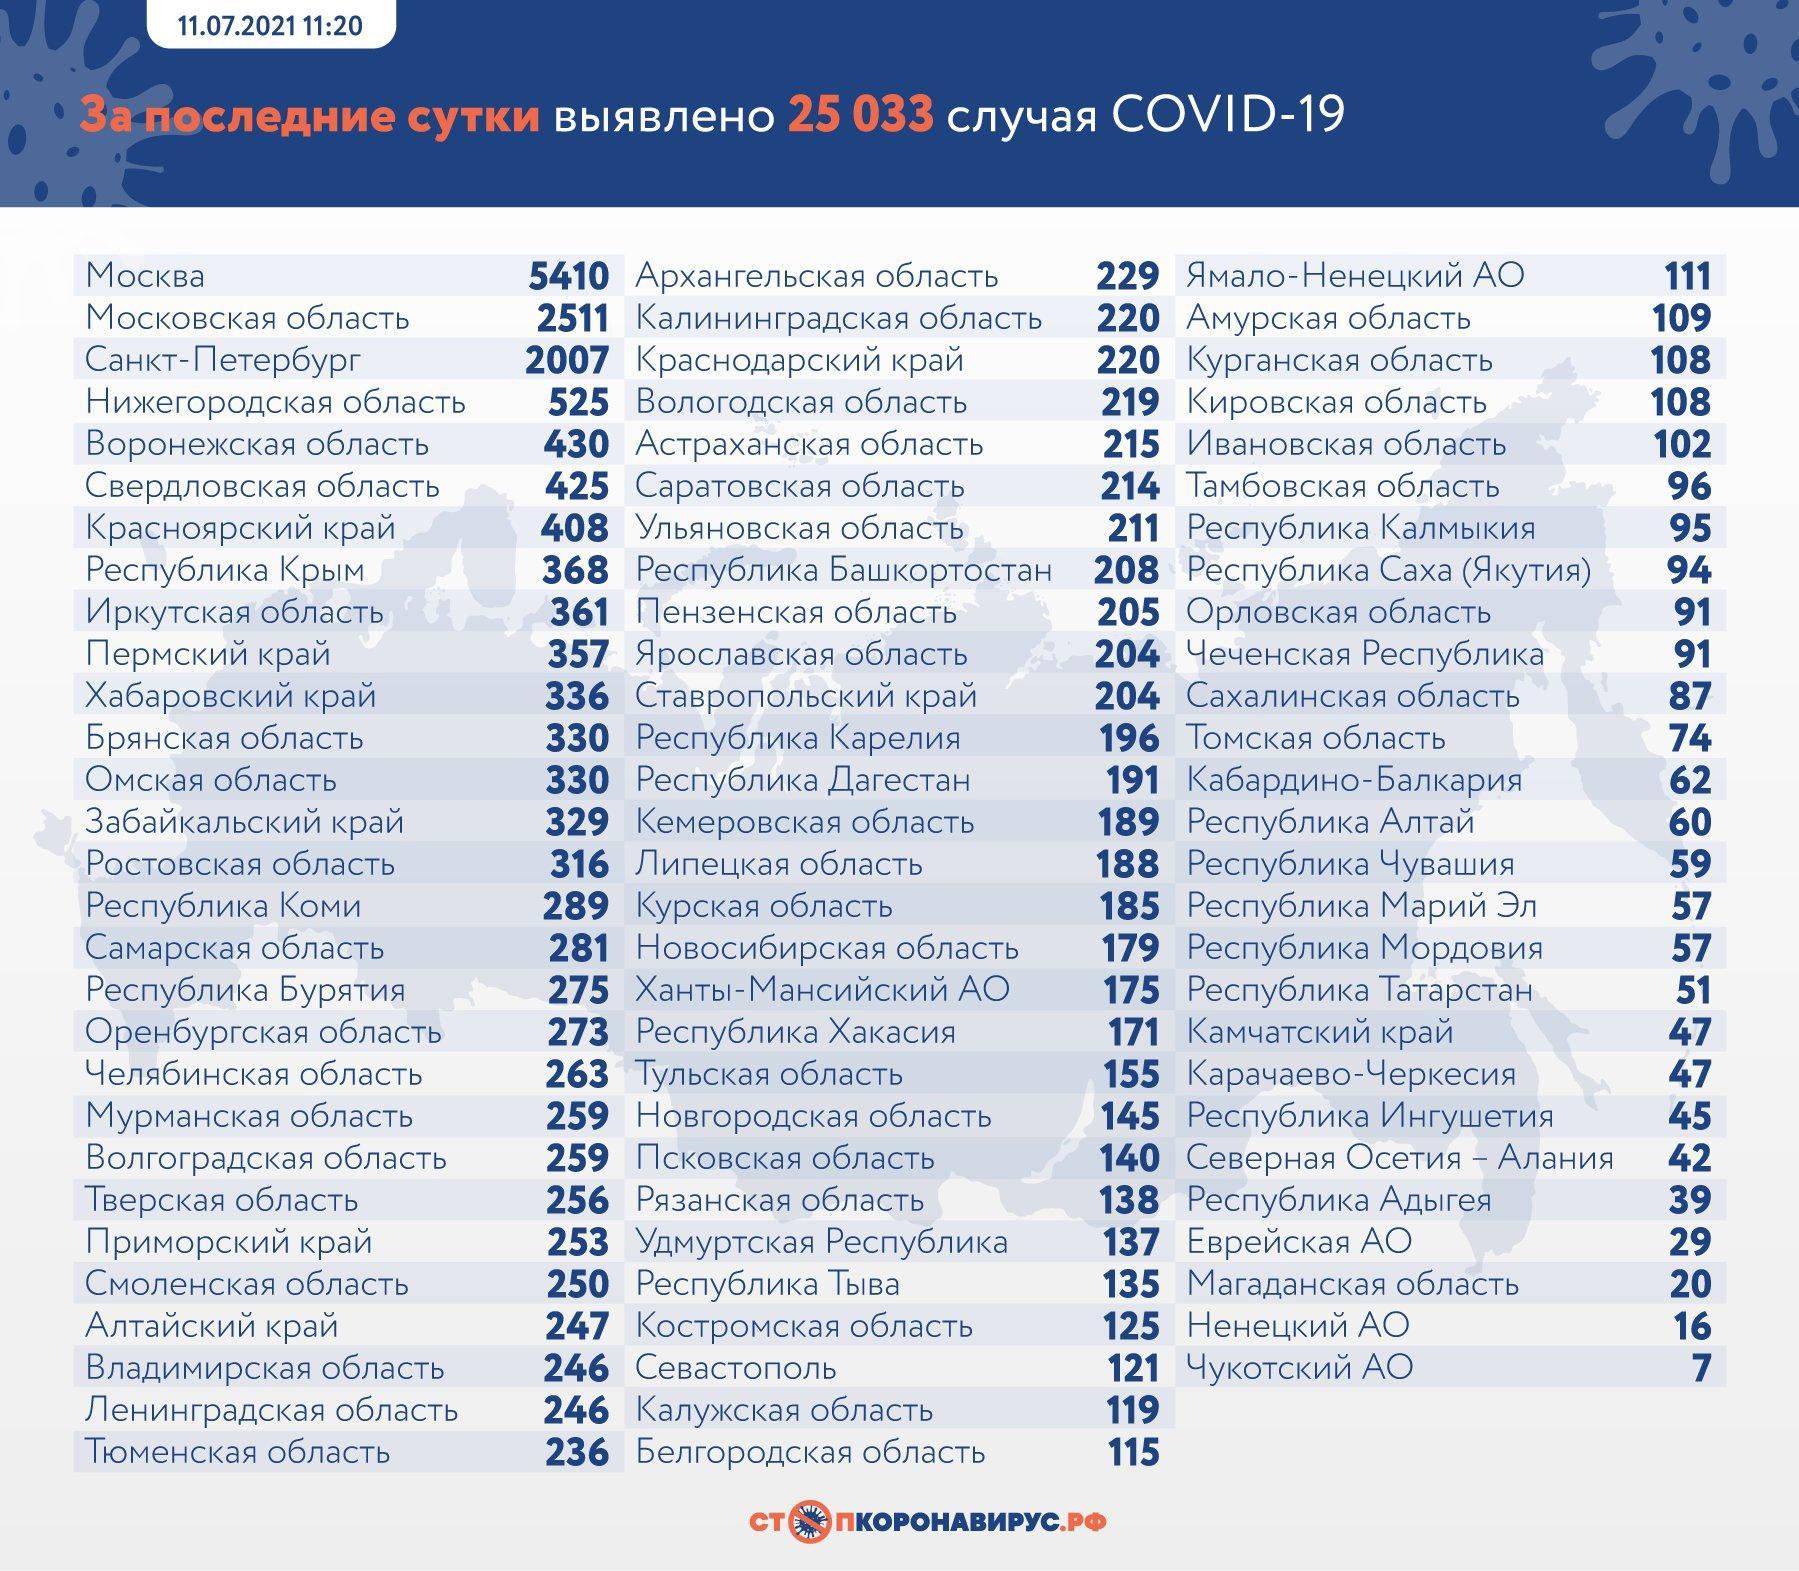 фото Три сибирских региона вошли в топ-15 по заражаемости COVID-19 2